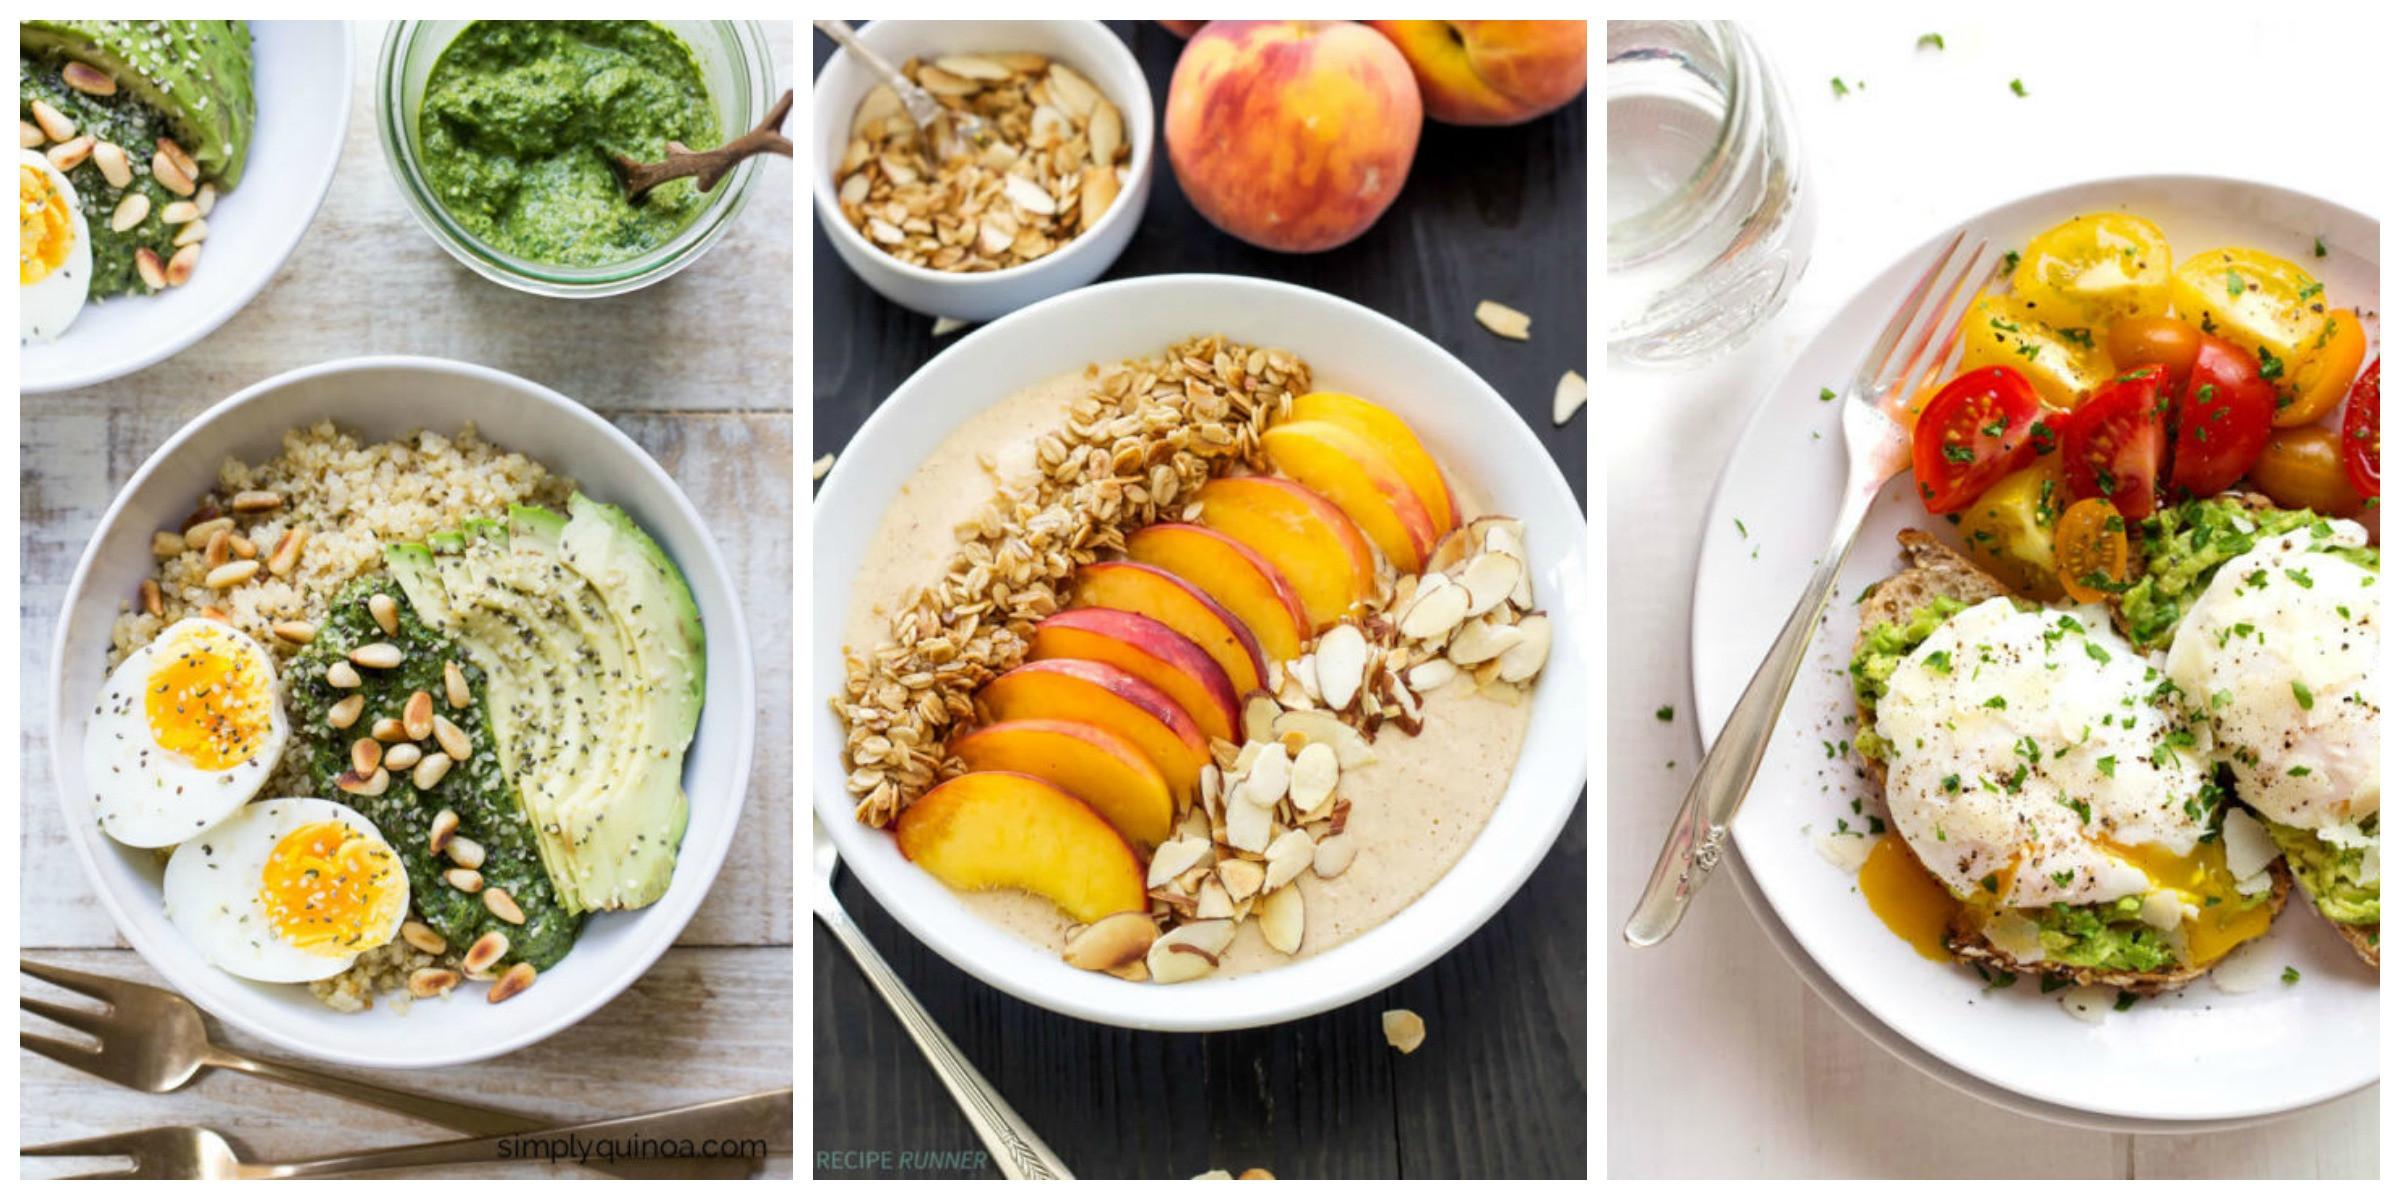 Good Healthy Breakfast Foods  20 Best Healthy Breakfast Food Ideas Recipes for Healthy